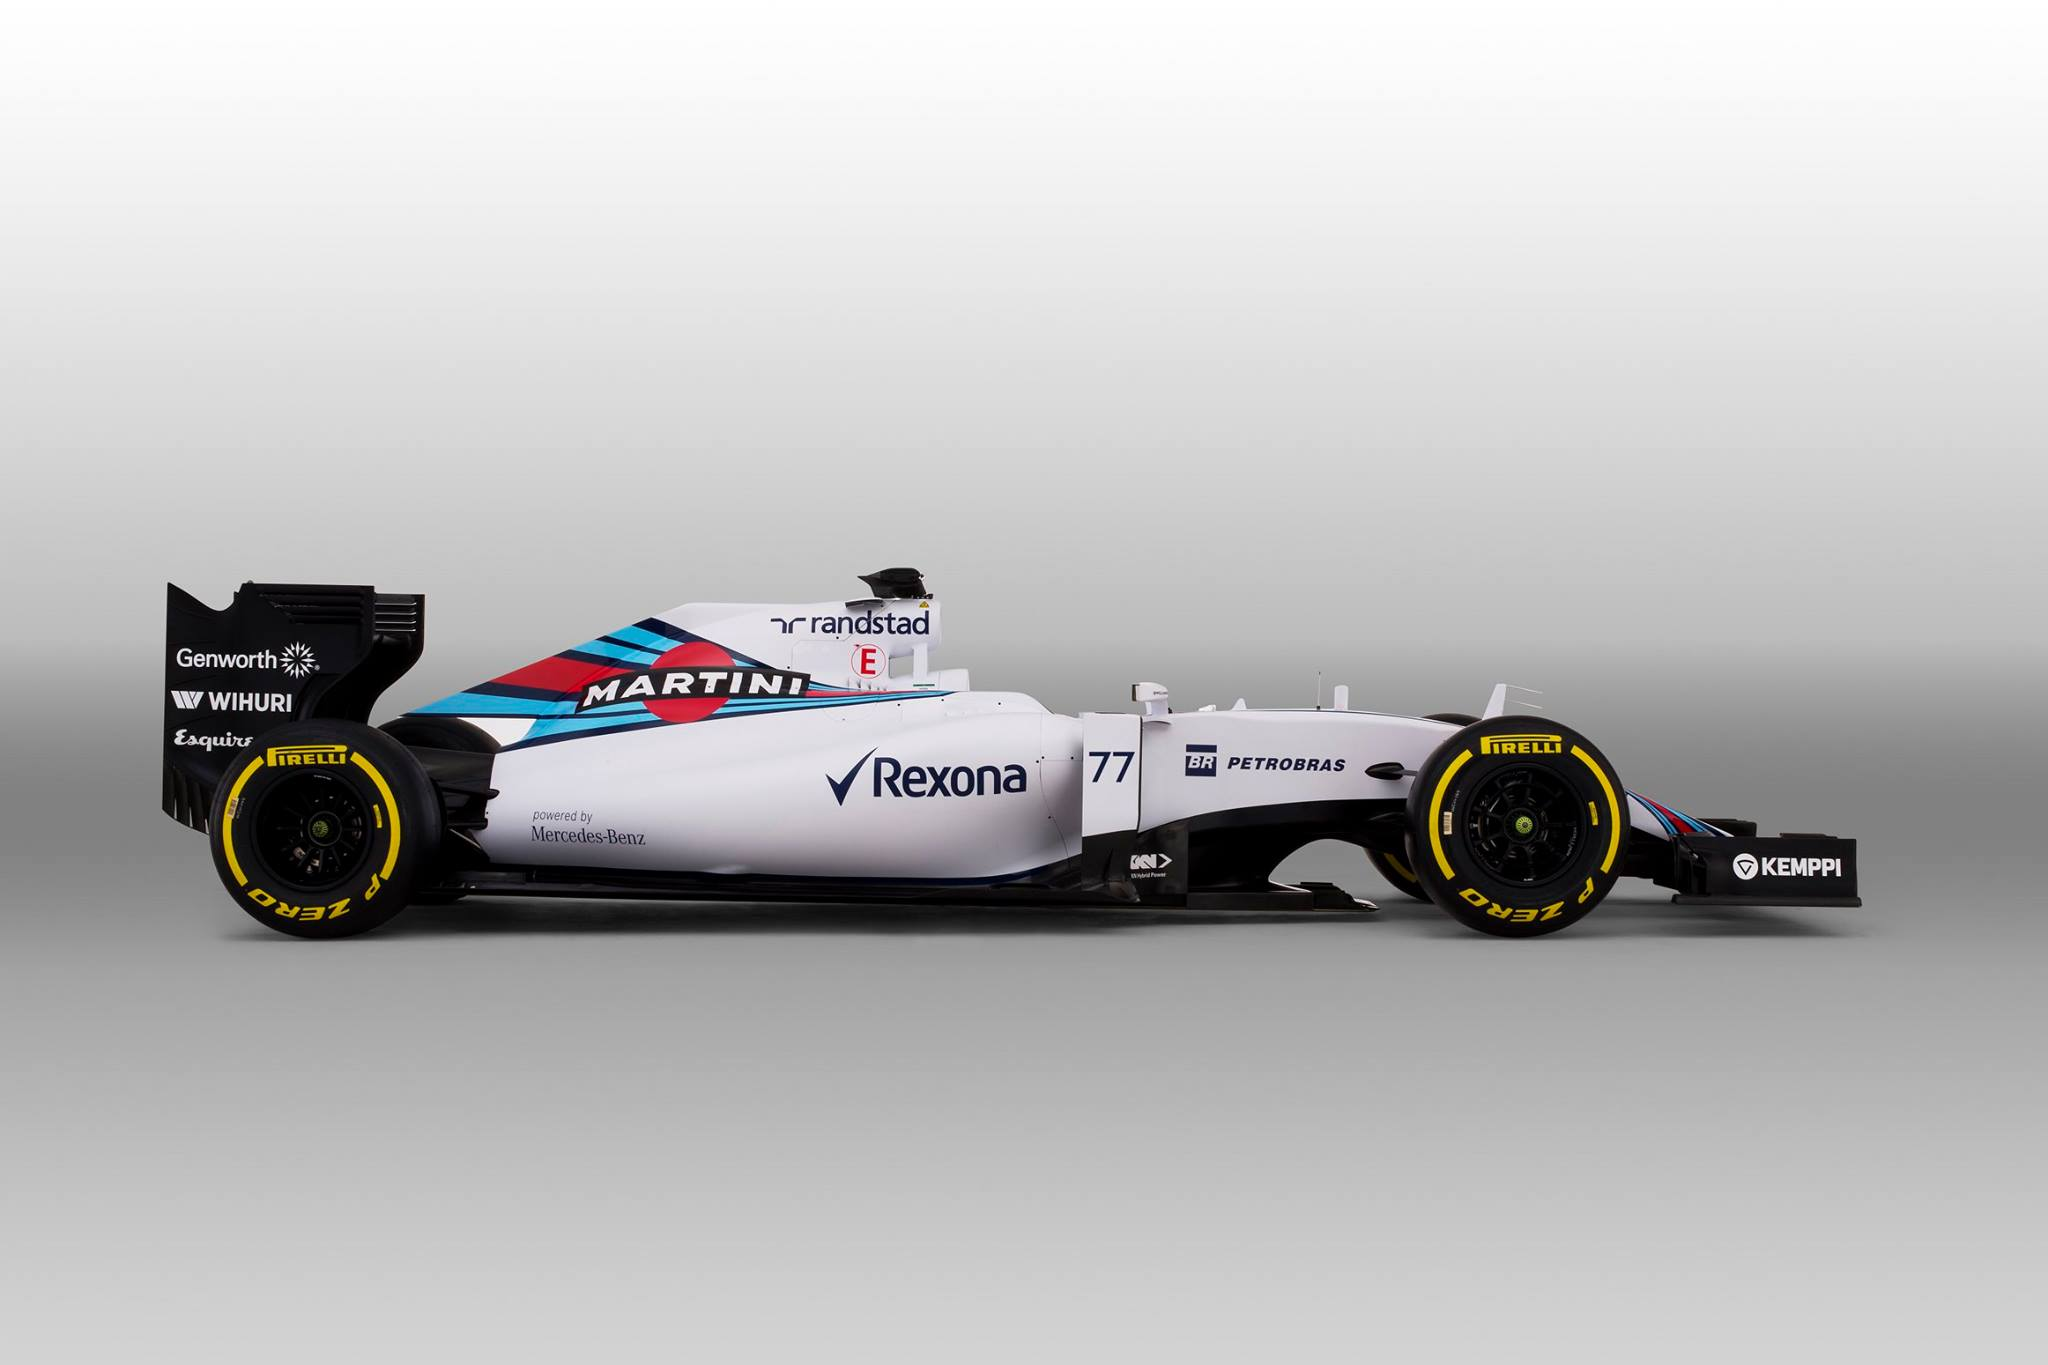 Videón a Williams F1 Team 2015-ös F1-es autója!